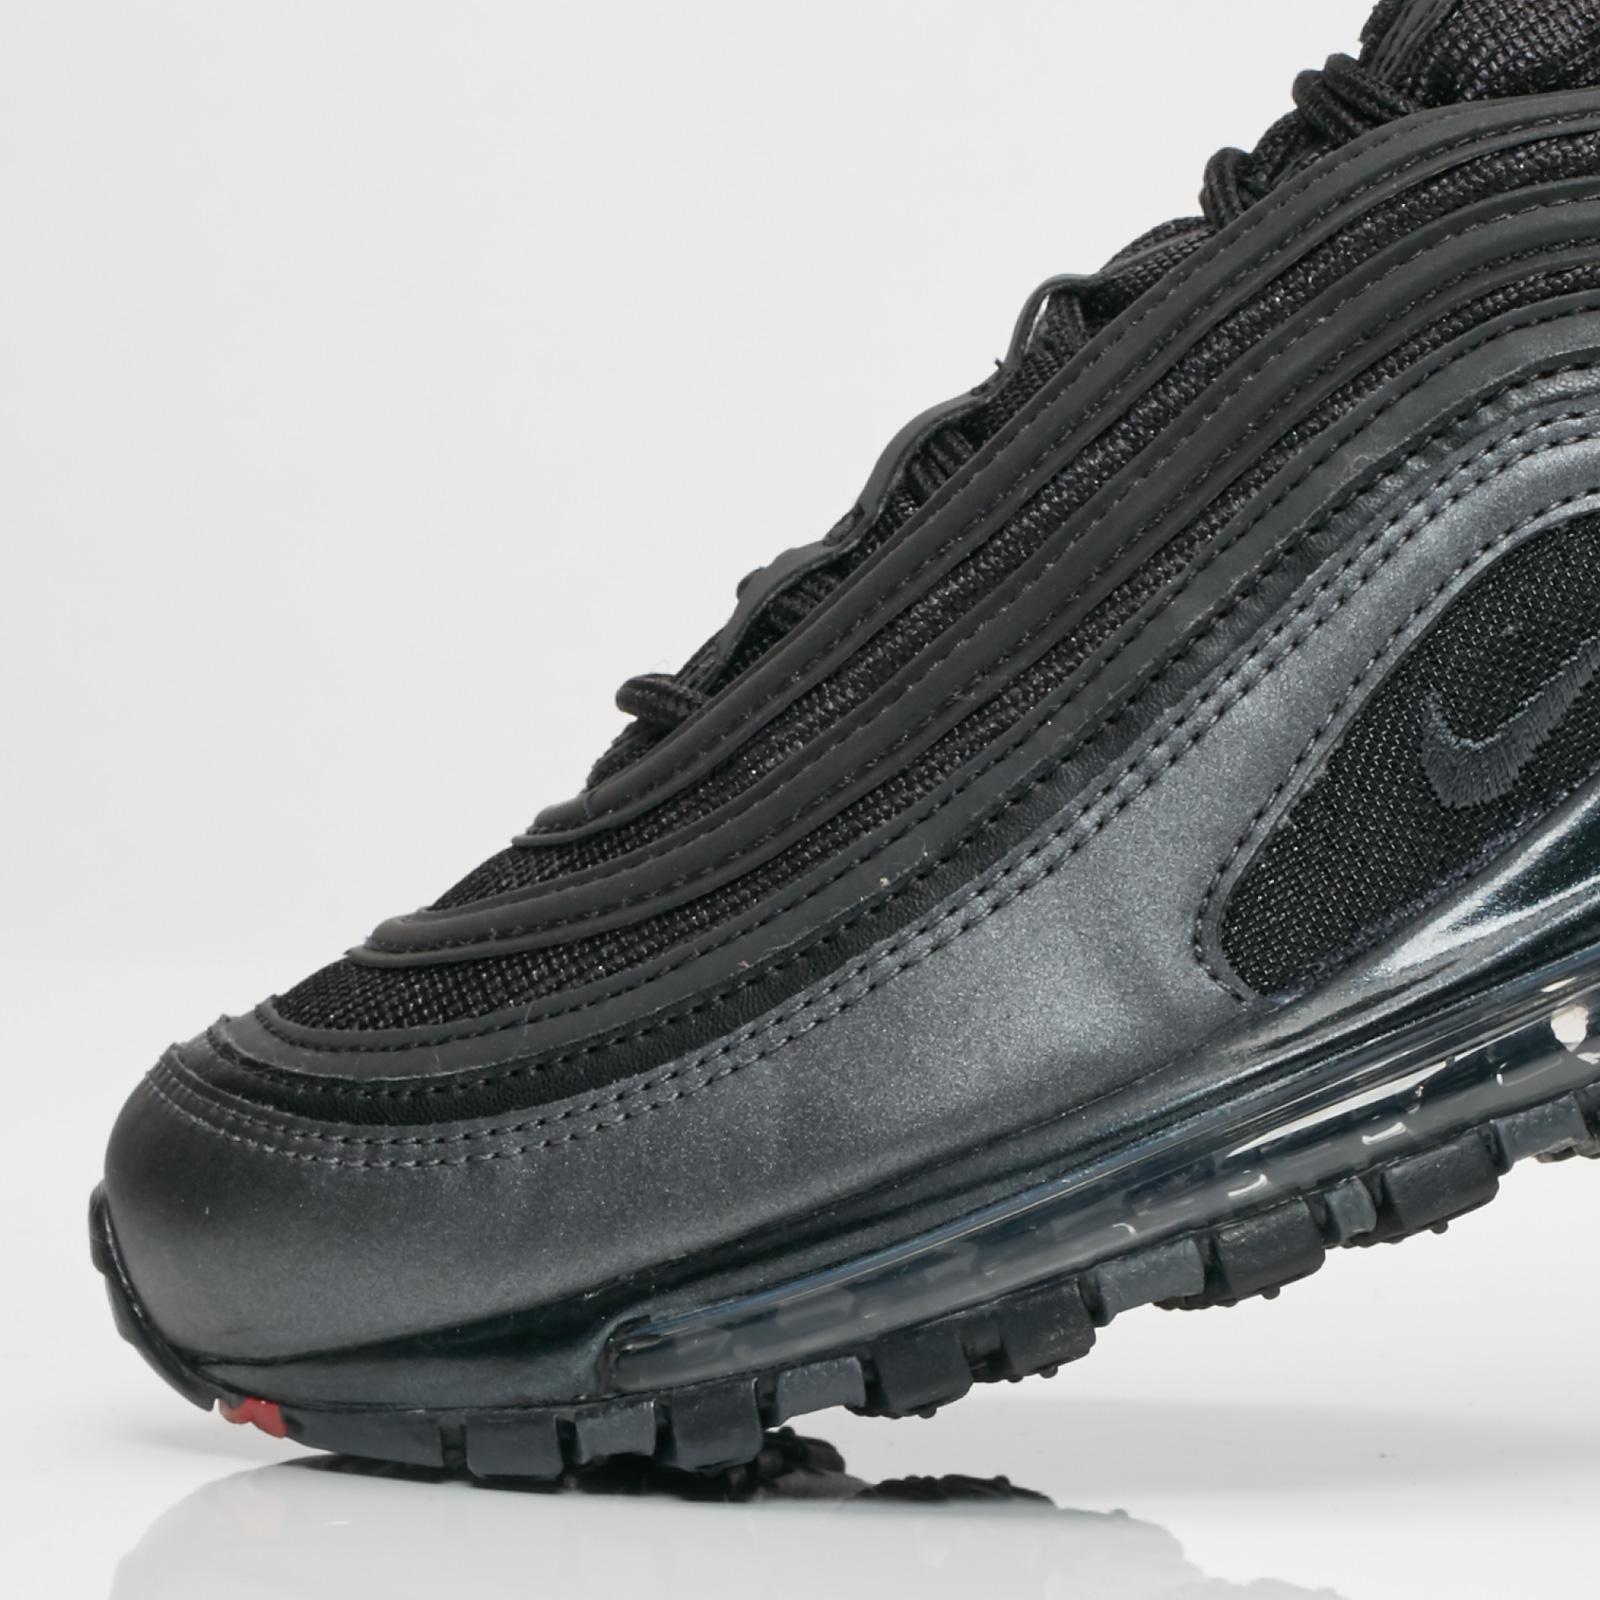 Nike Air Max 97 BlackAnthraciteMetallic HematiteDark Grey